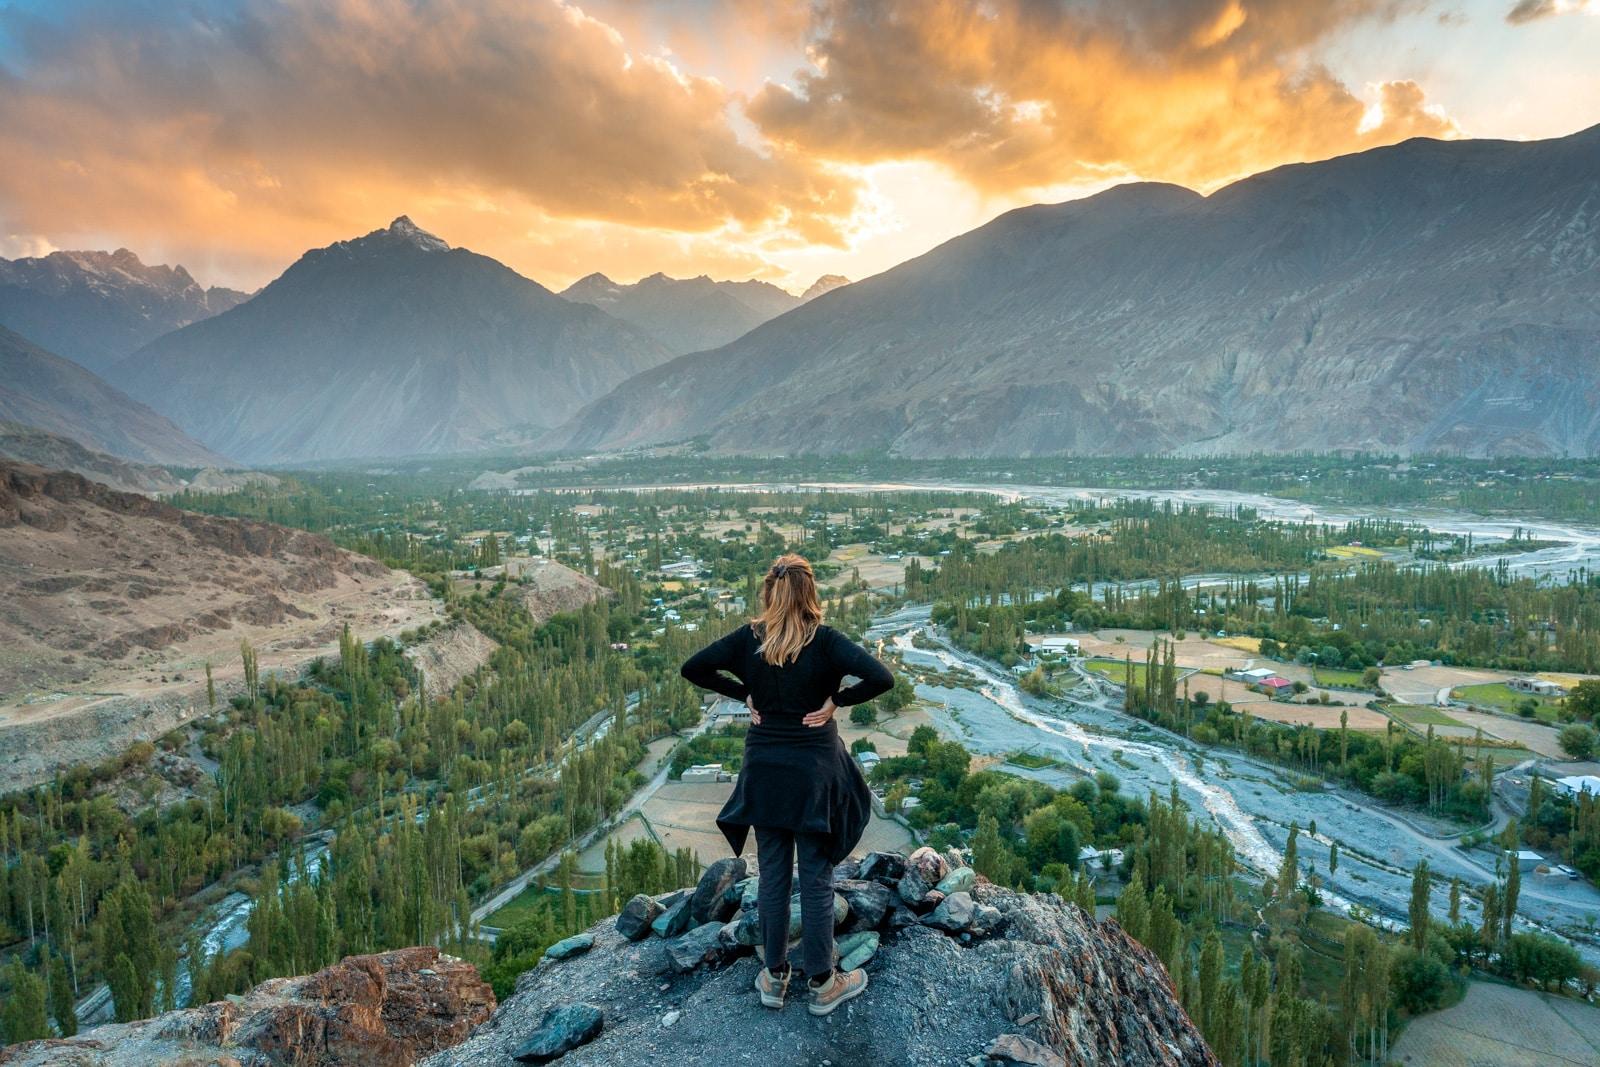 Female traveler watching sunset from Muduri Fort in Yasin Valley, Pakistan